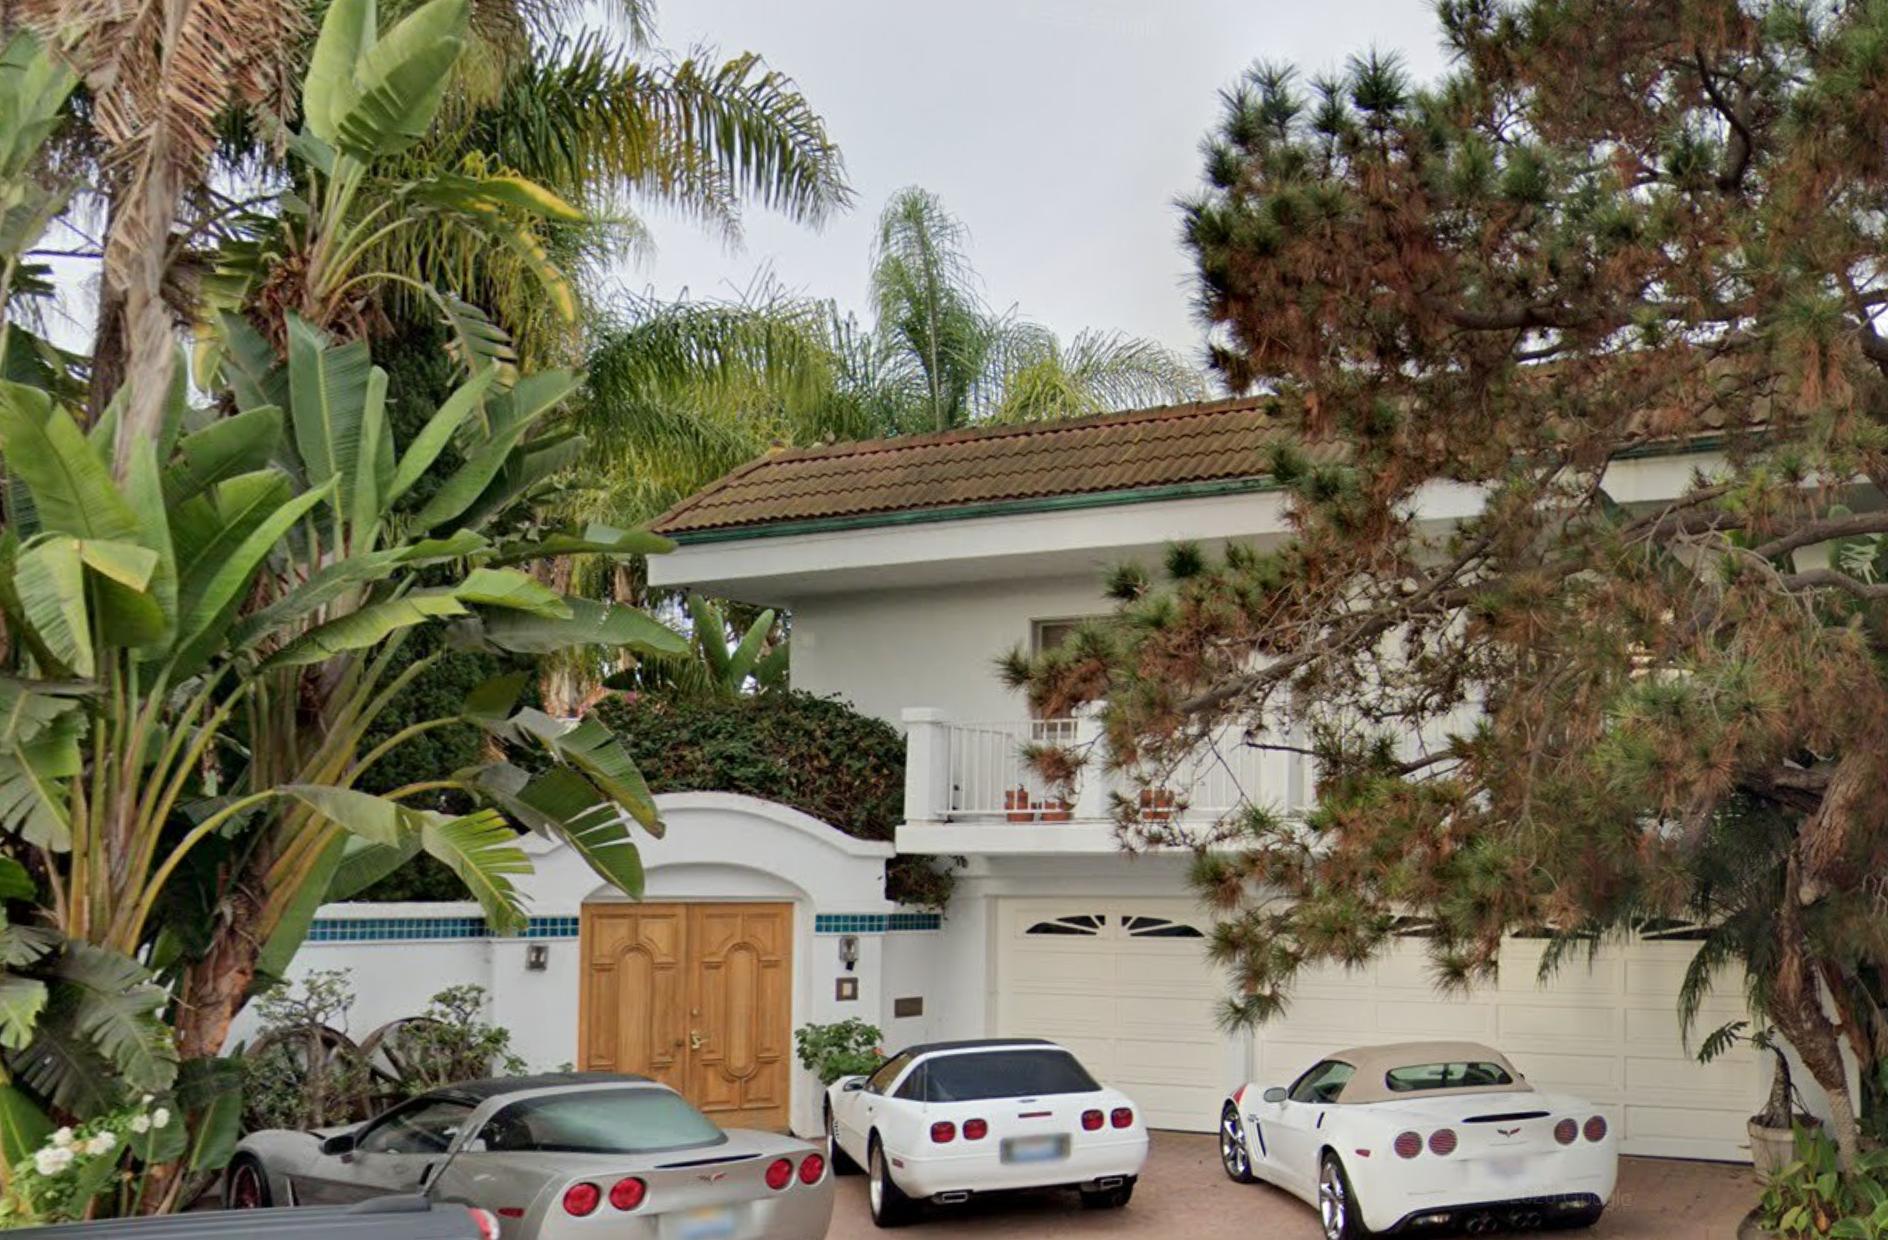 $1,500,000 Newport Beach, CA